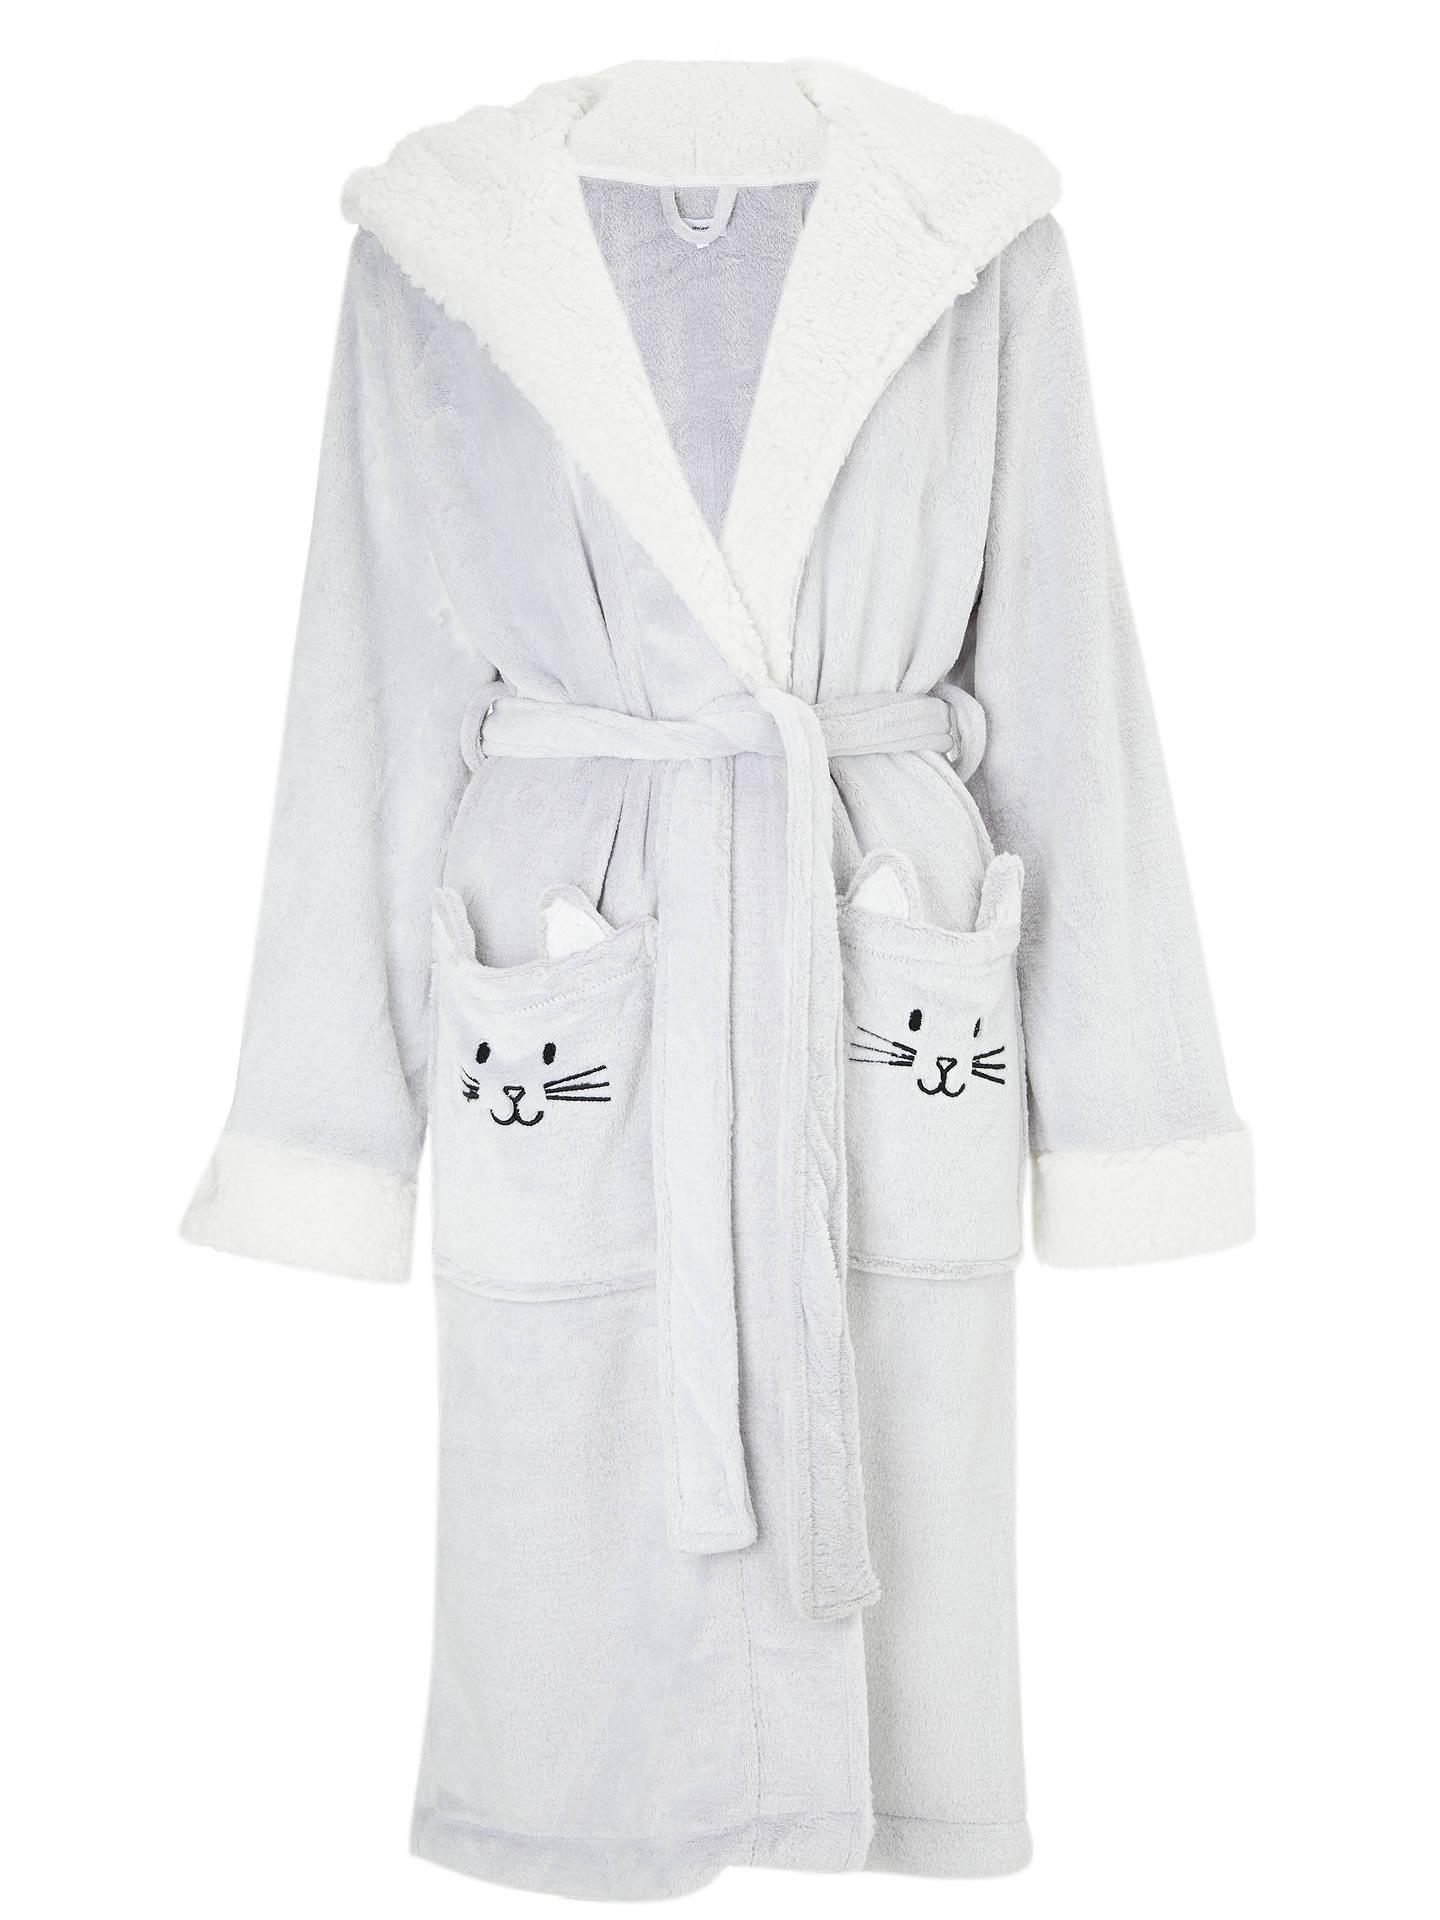 John Lewis Cat Fleece Hooded Dressing Gown Grey At John Lewis